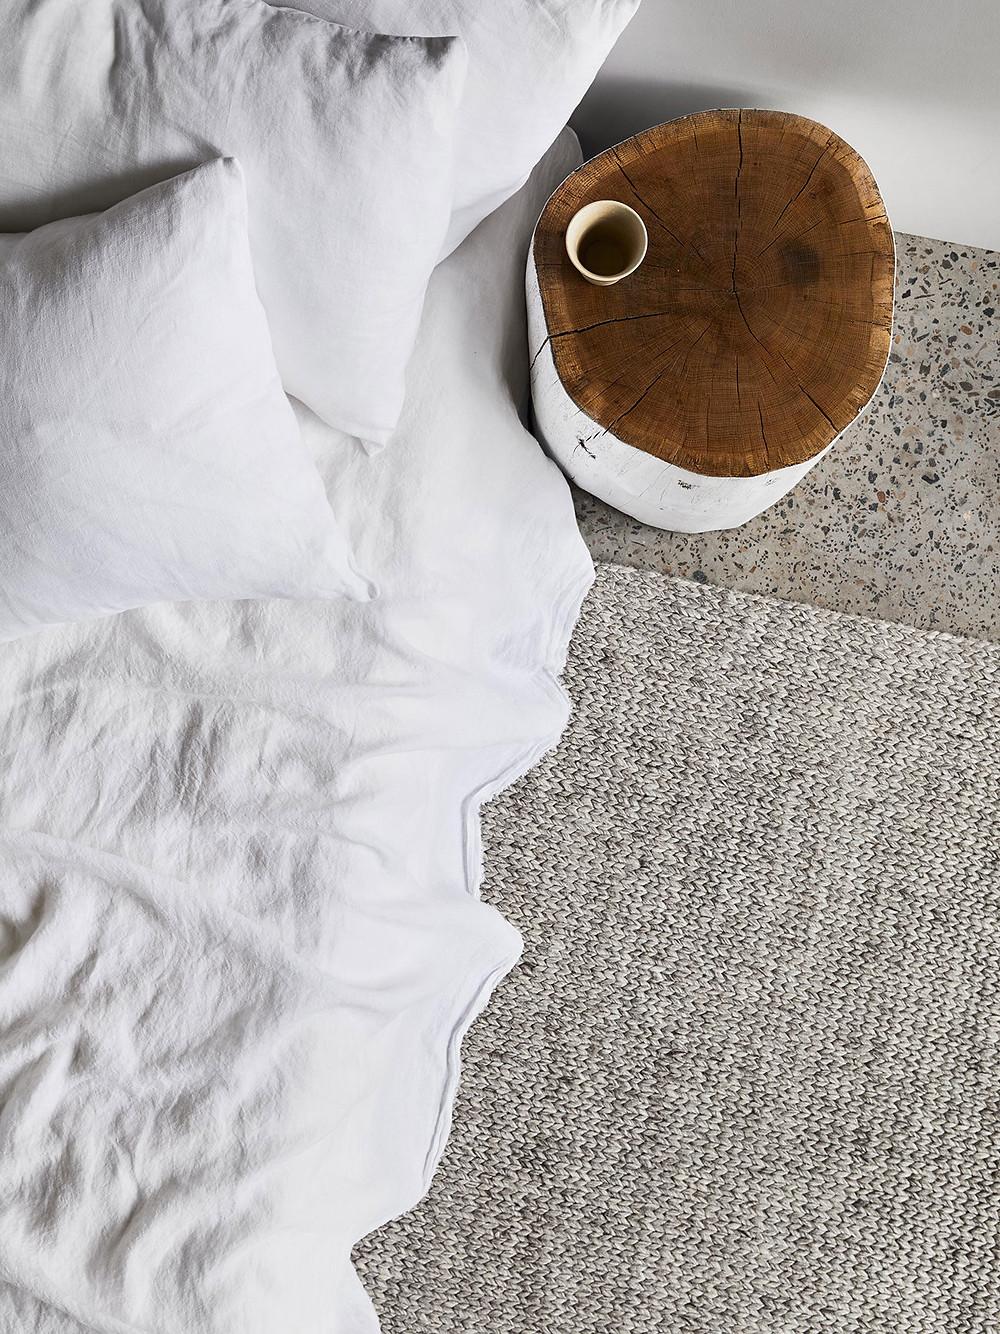 Eco friendly home decor brands you should know, Barbulianno Design